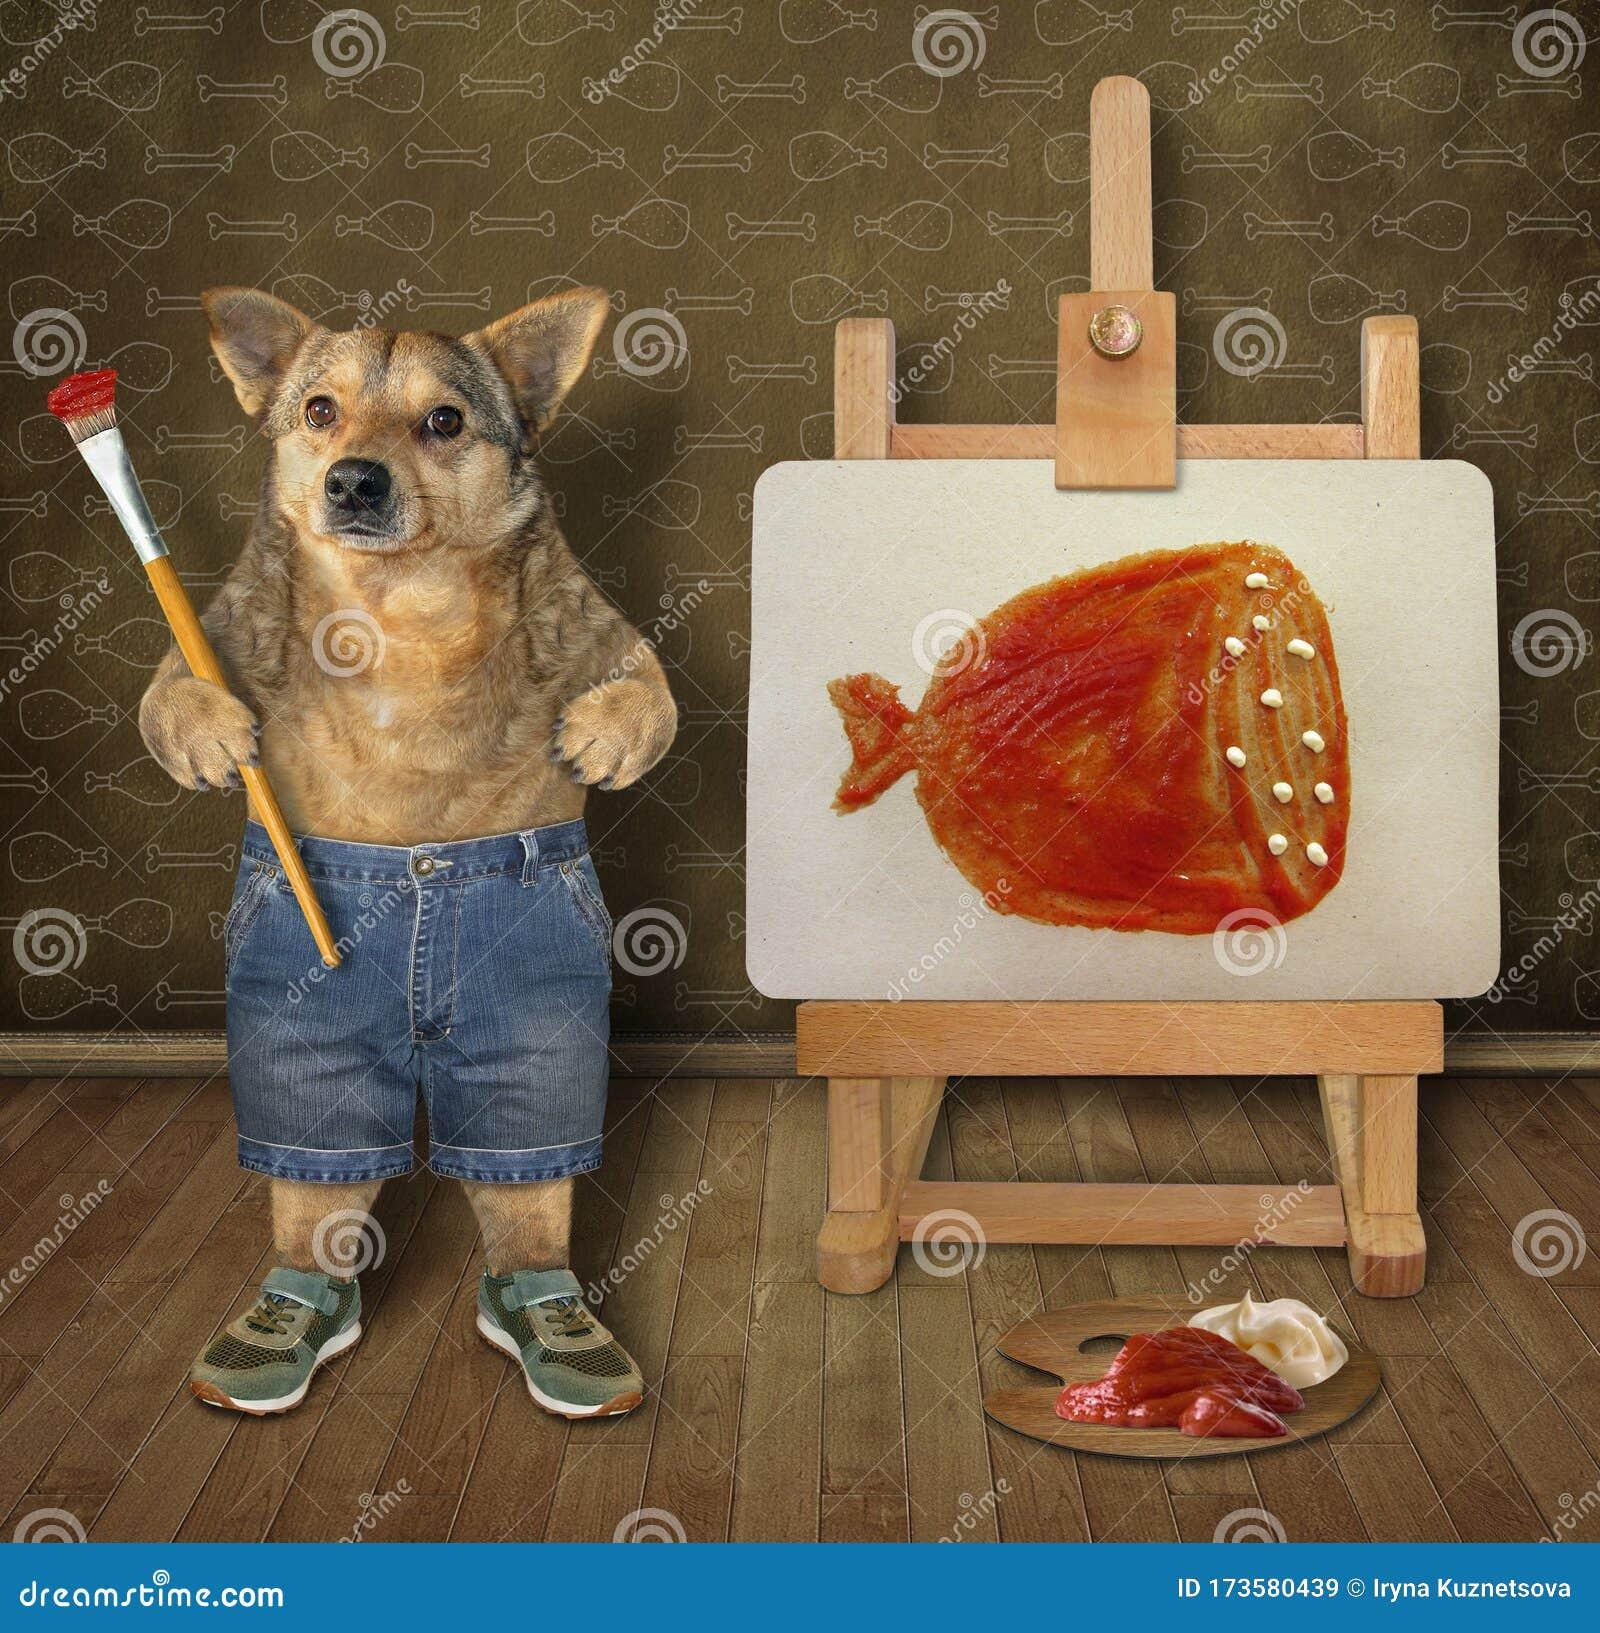 Dog Artist Painting On Canvas 3 Stock Image Image Of Clothing Closeup 173580439